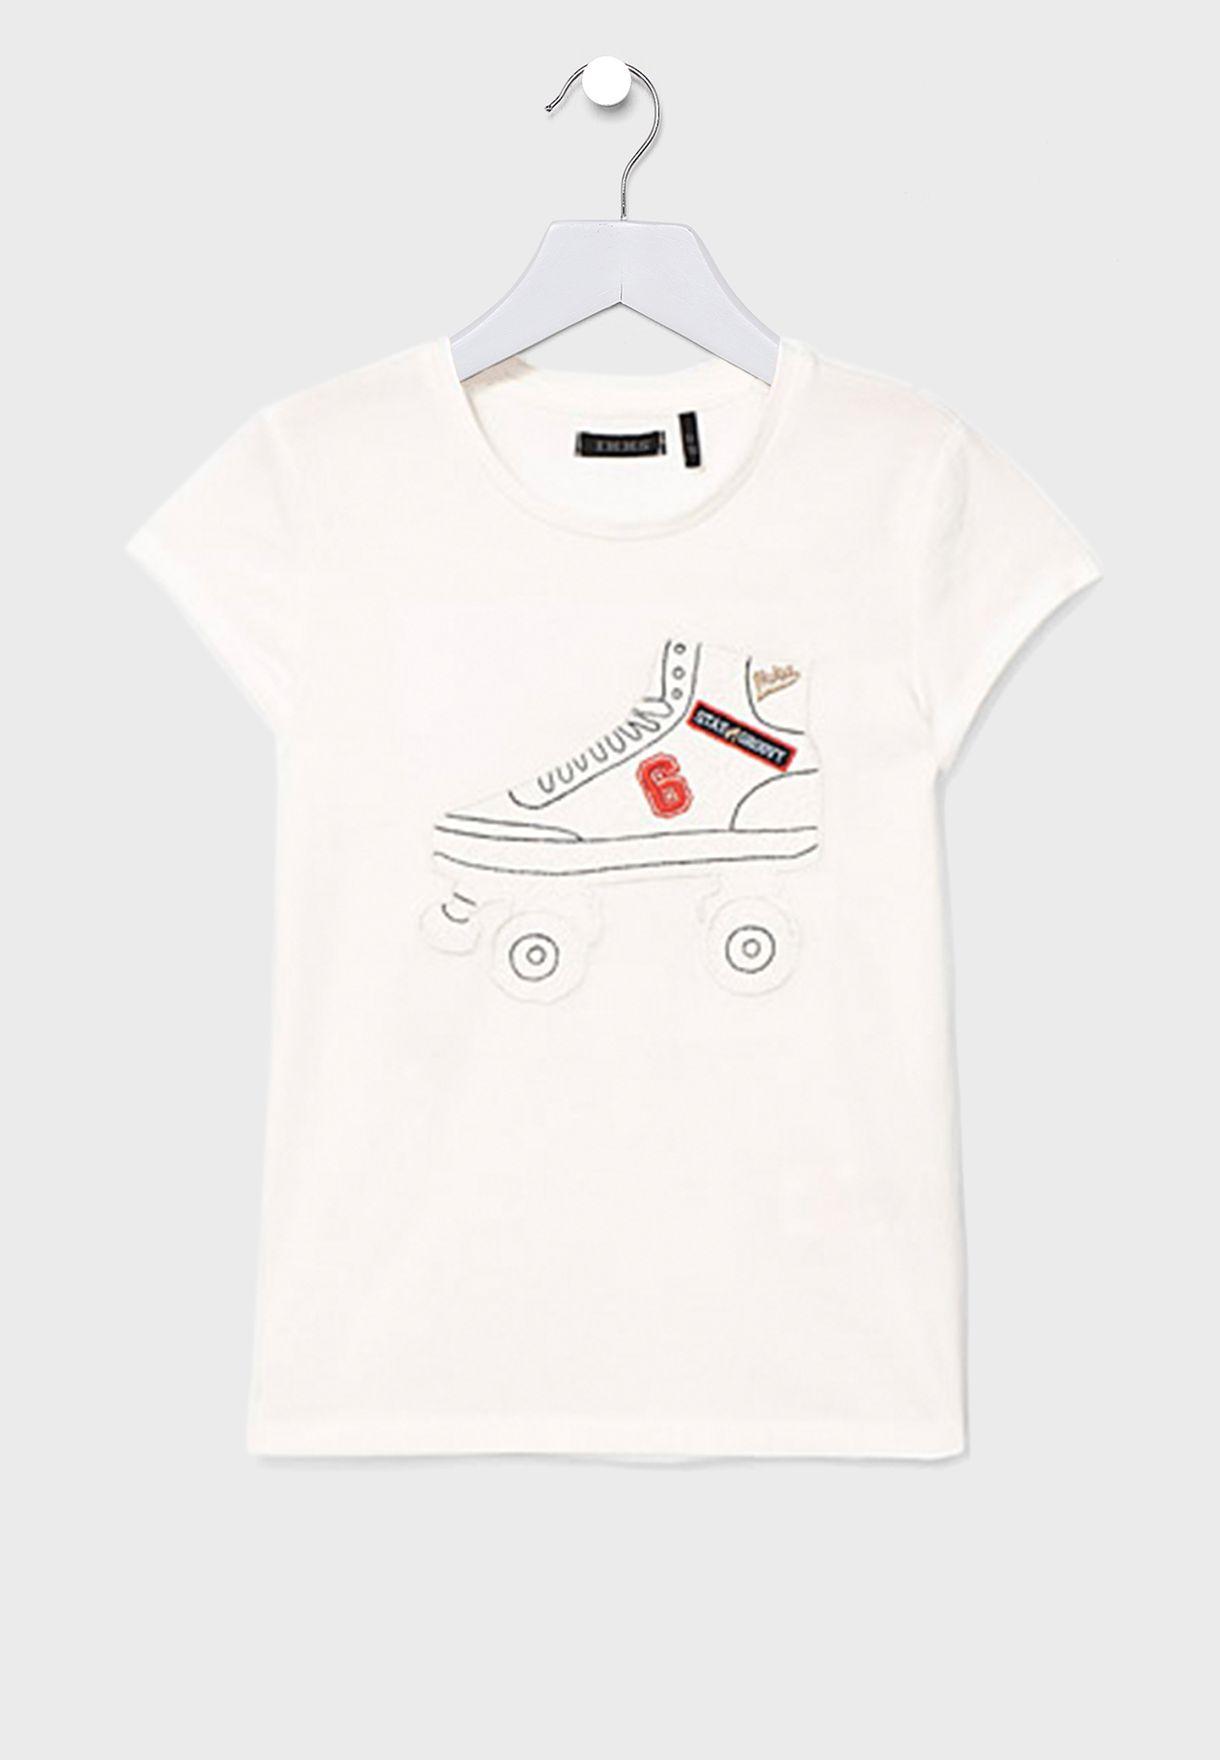 Youth Roller Skates T-Shirt